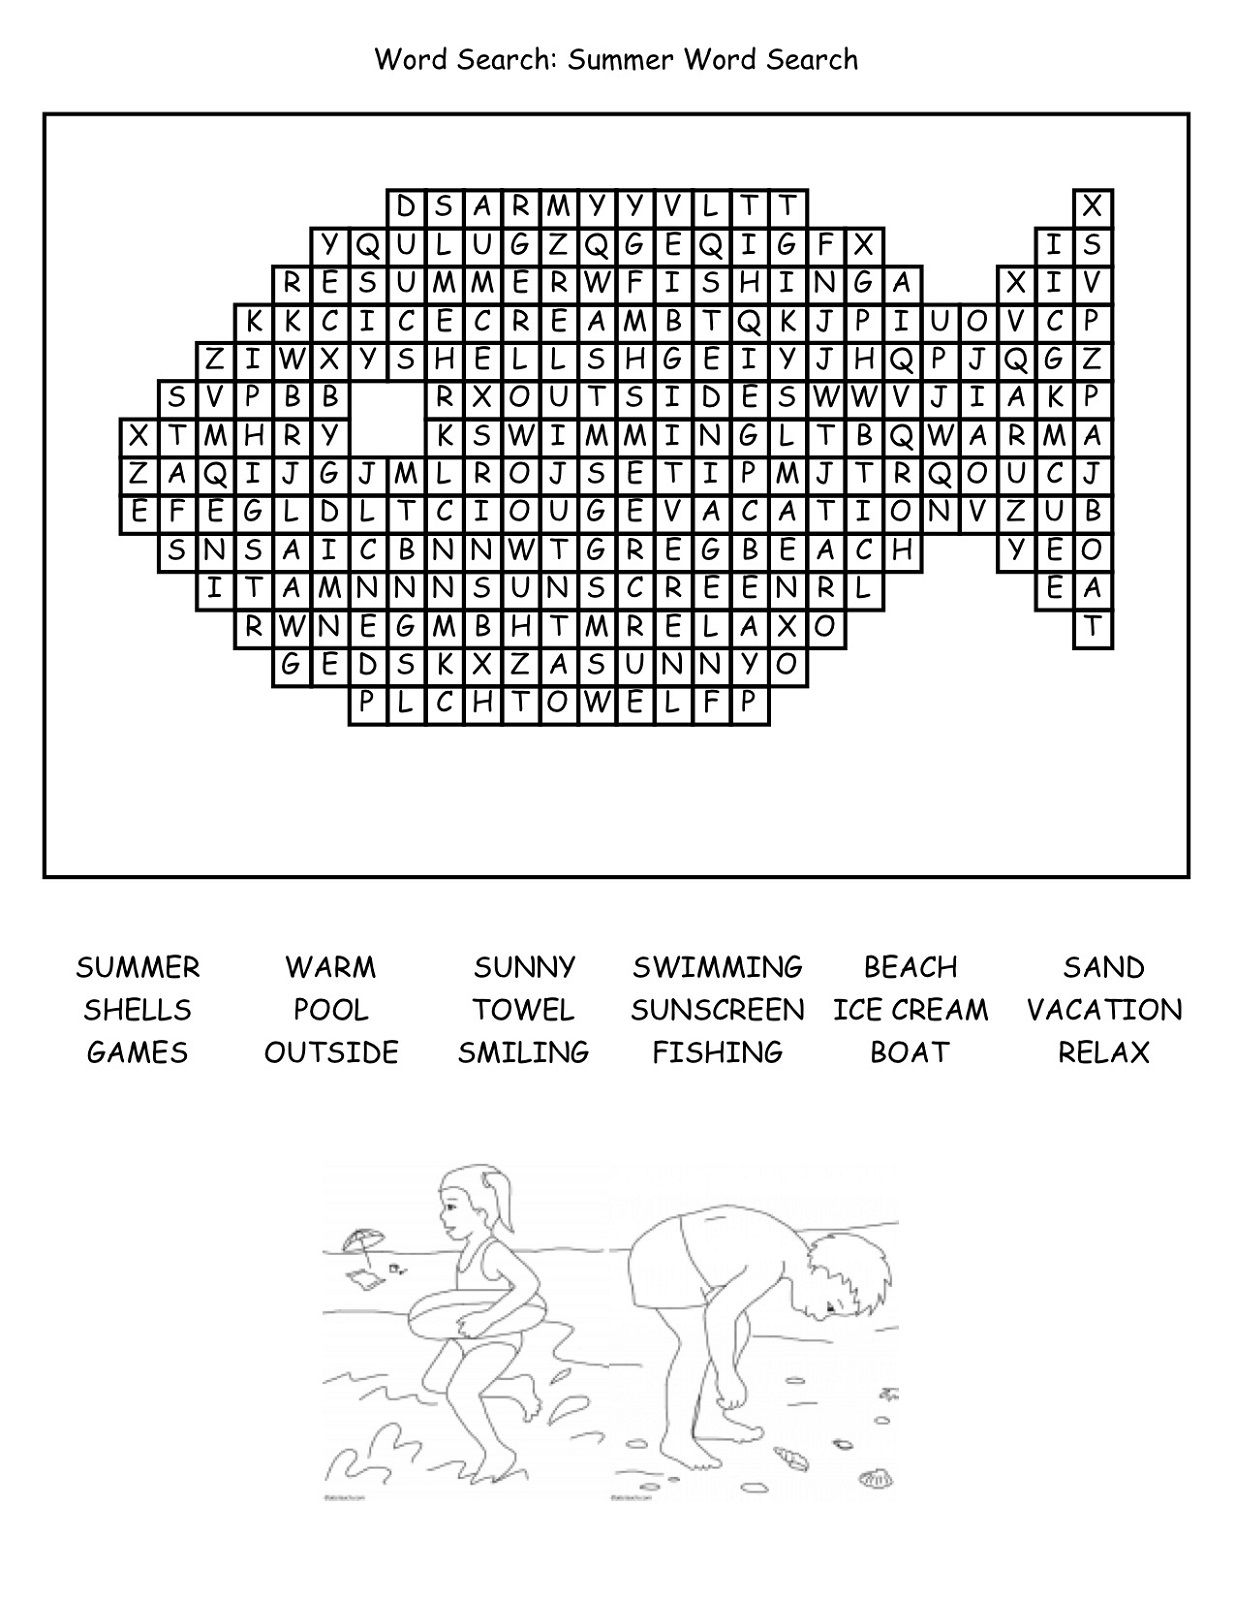 Fun Printable Games